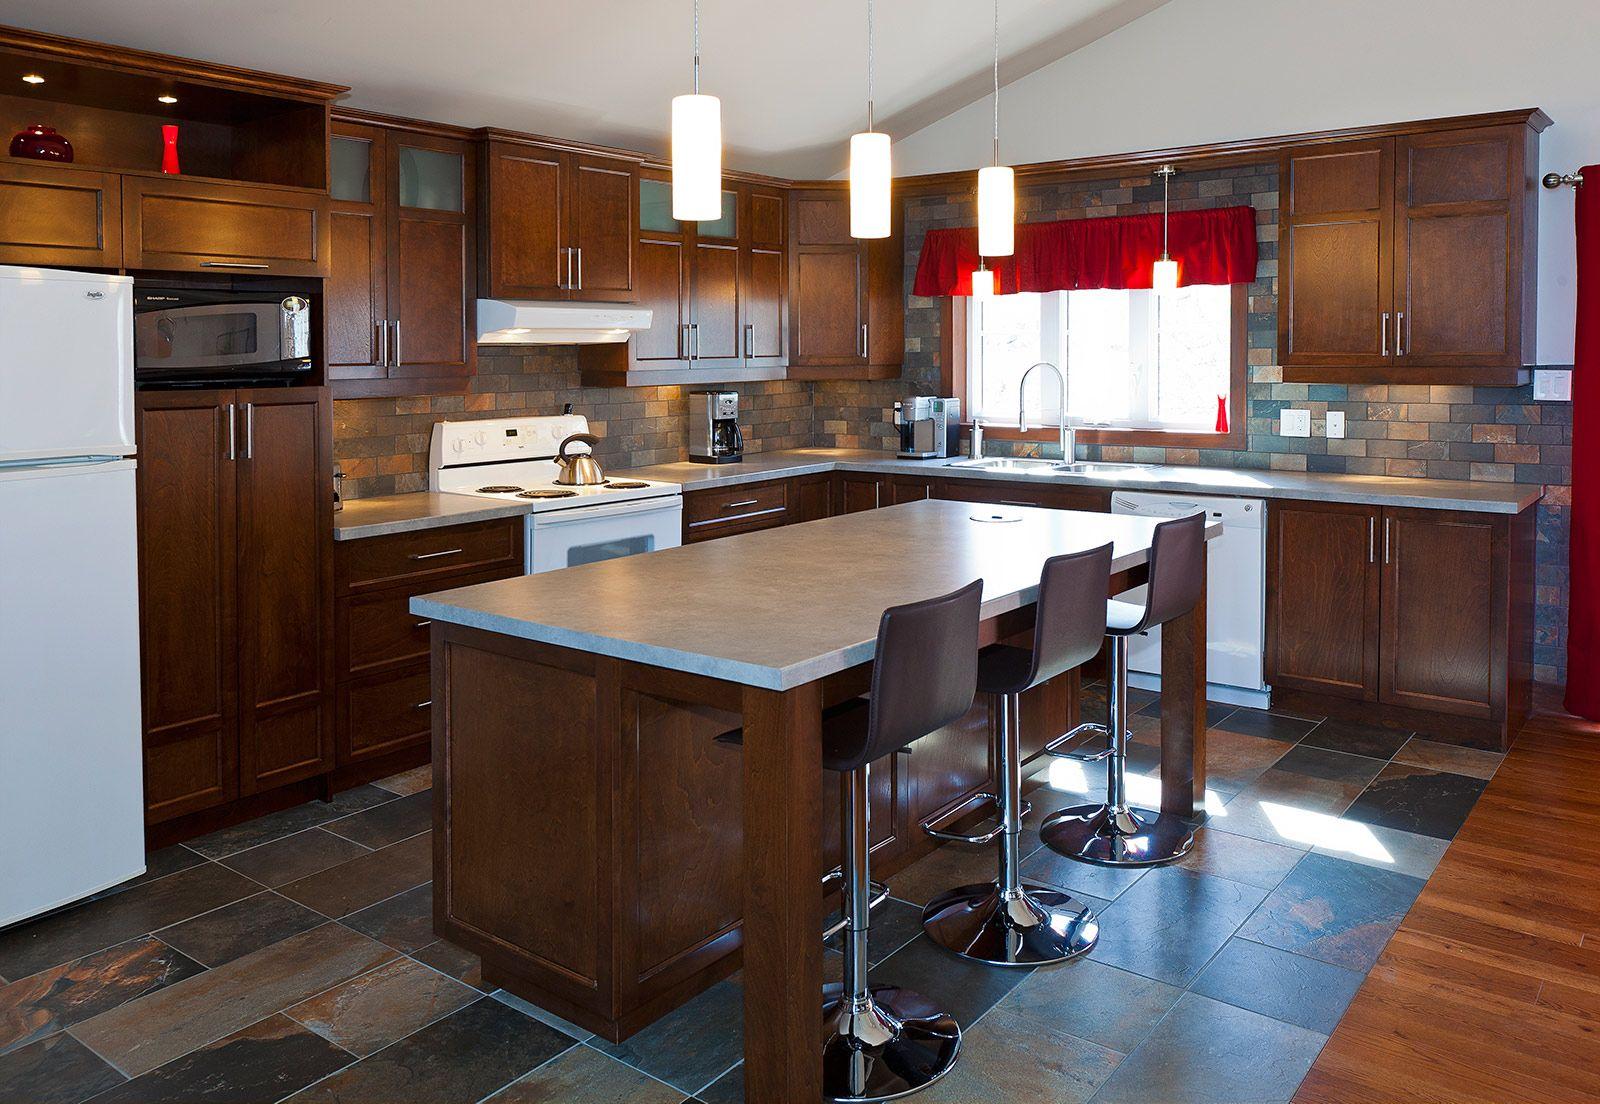 Cuisine comptoir cuisine ouverte avec comptoir cuisine en for Comptoir cuisine ouverte